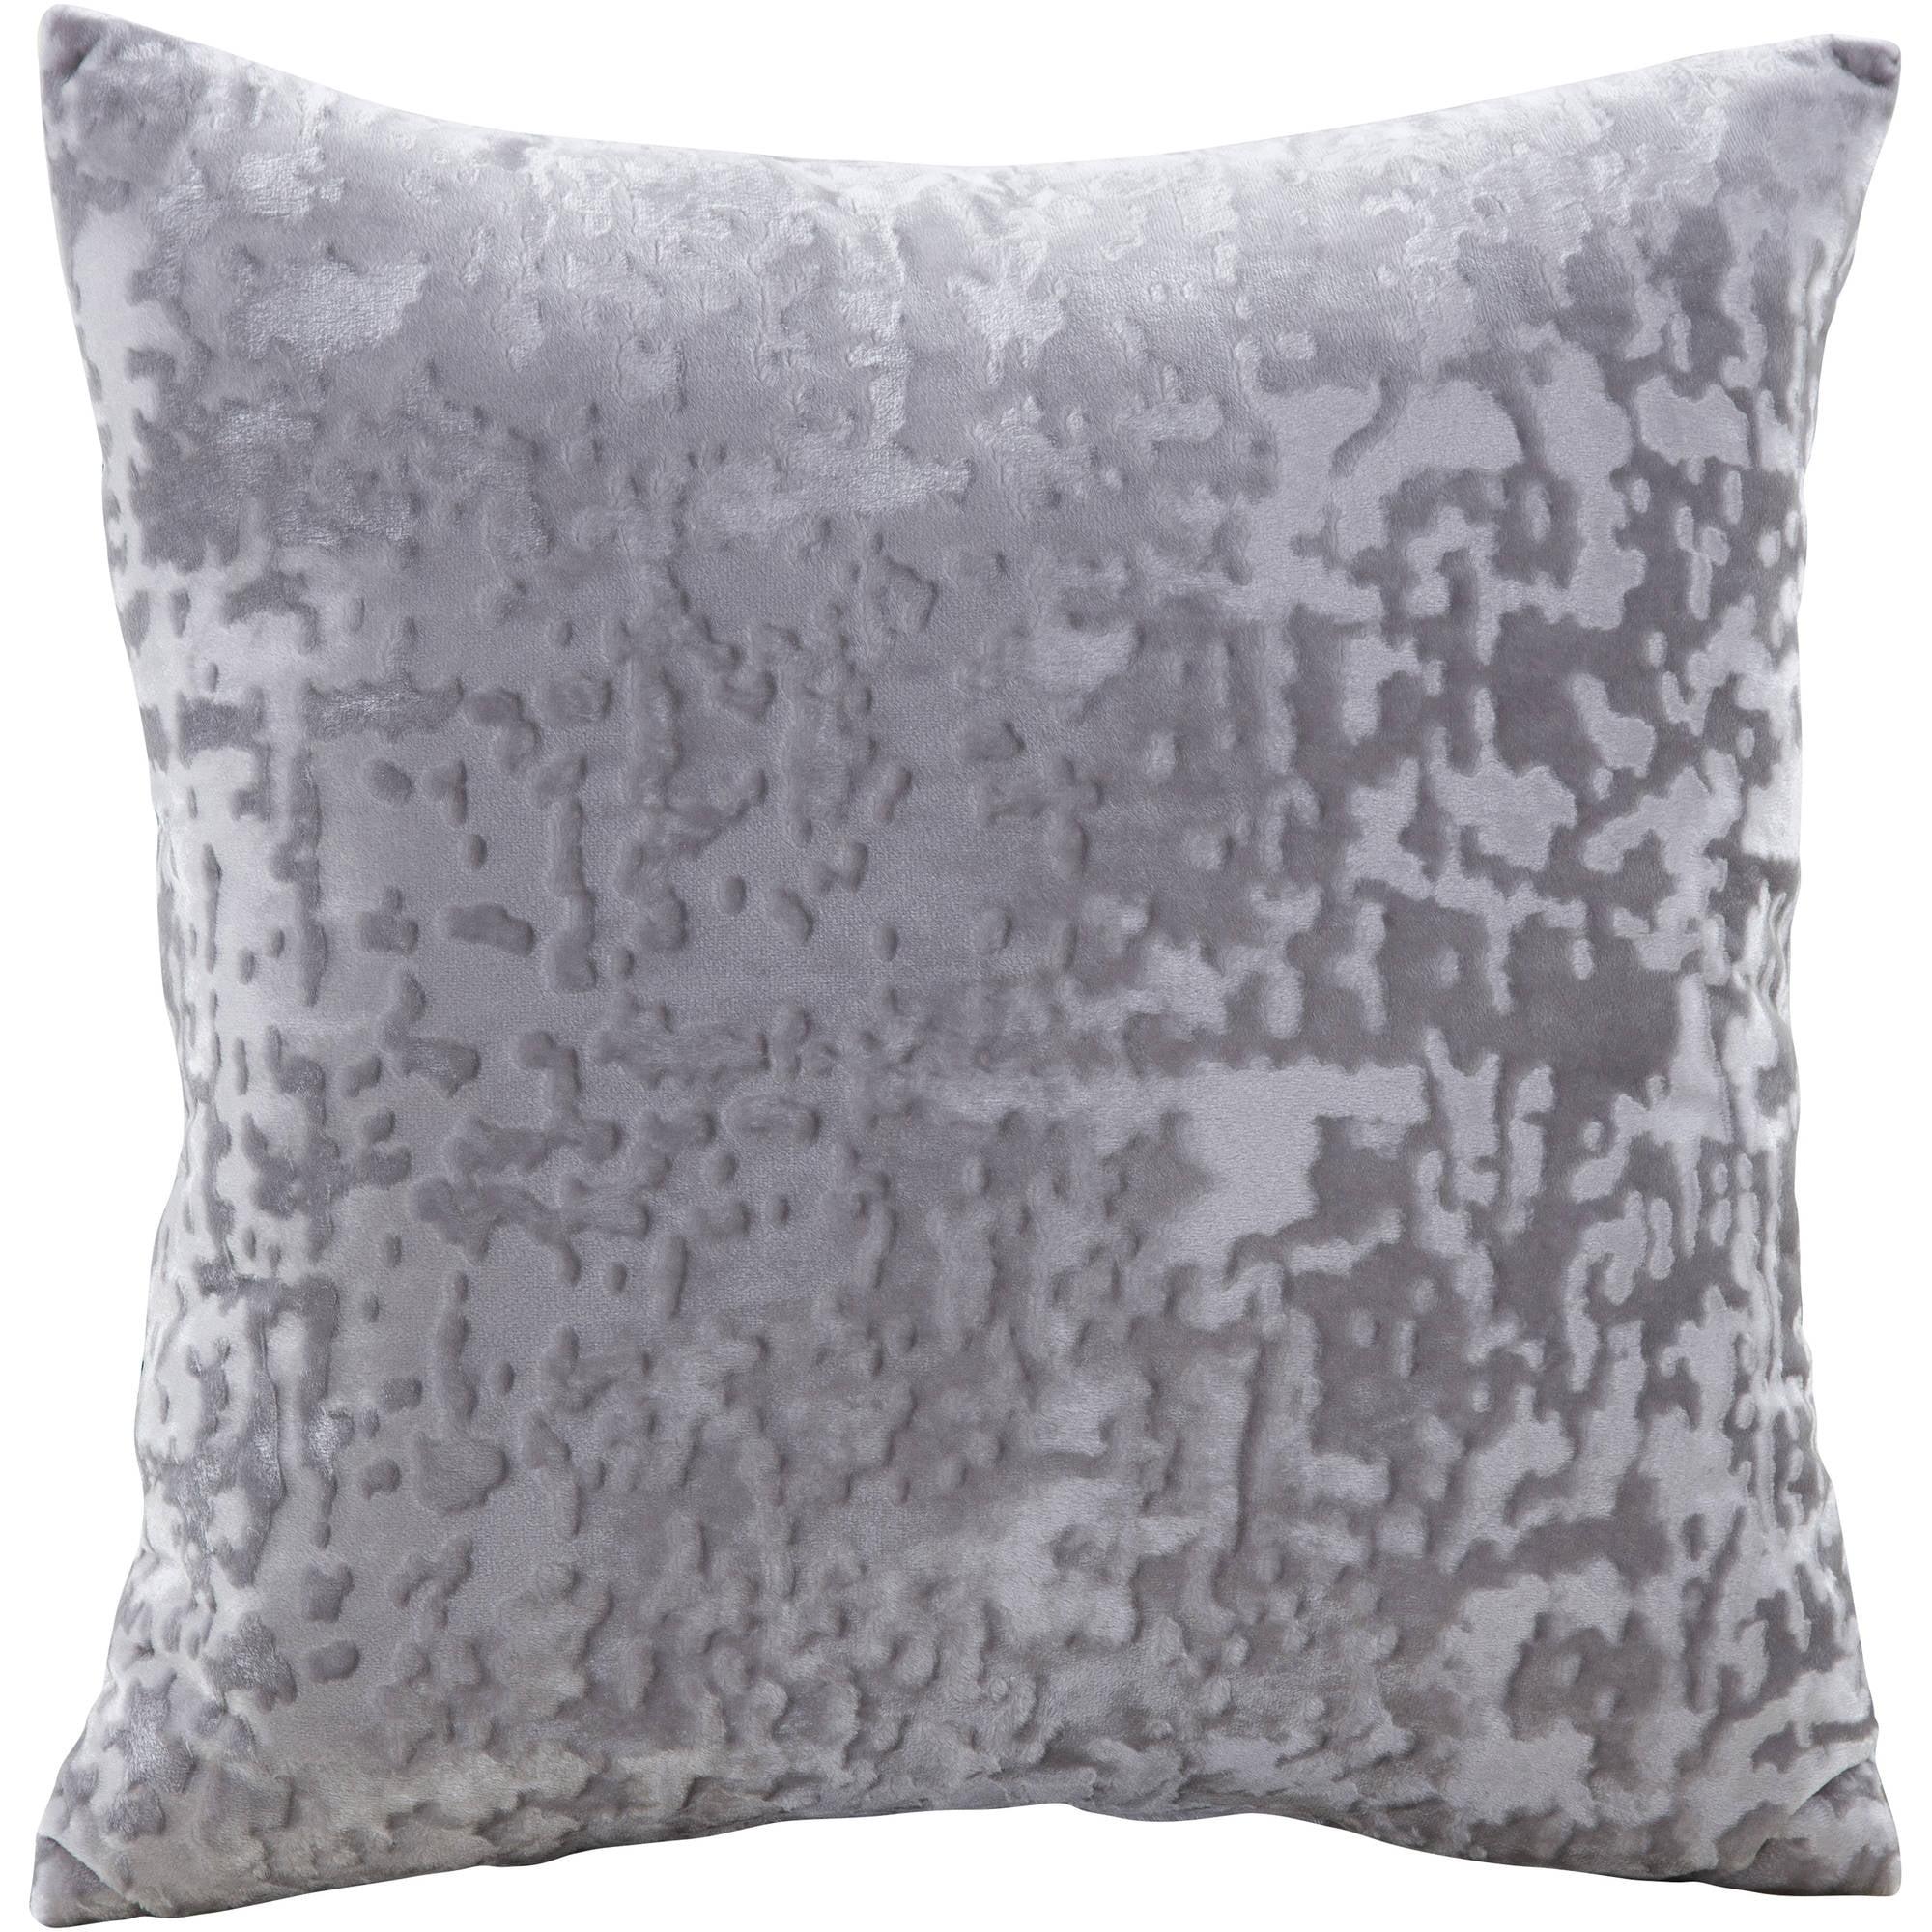 gray decorative pillows  walmartcom - mainstays velvet decorative pillow grey